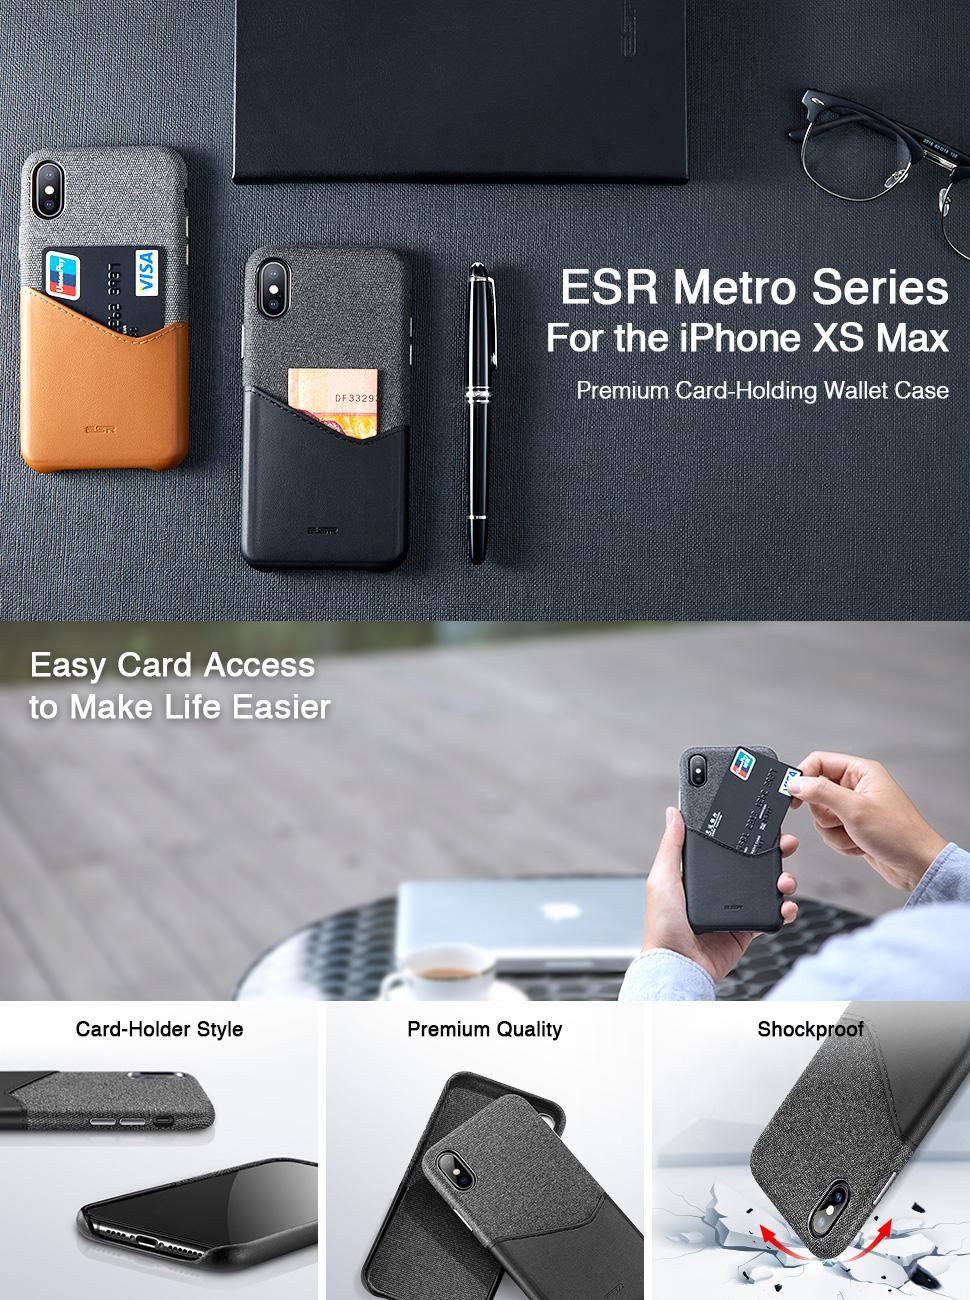 ESR Metro case for iPhone XS Max, Gohub Shop